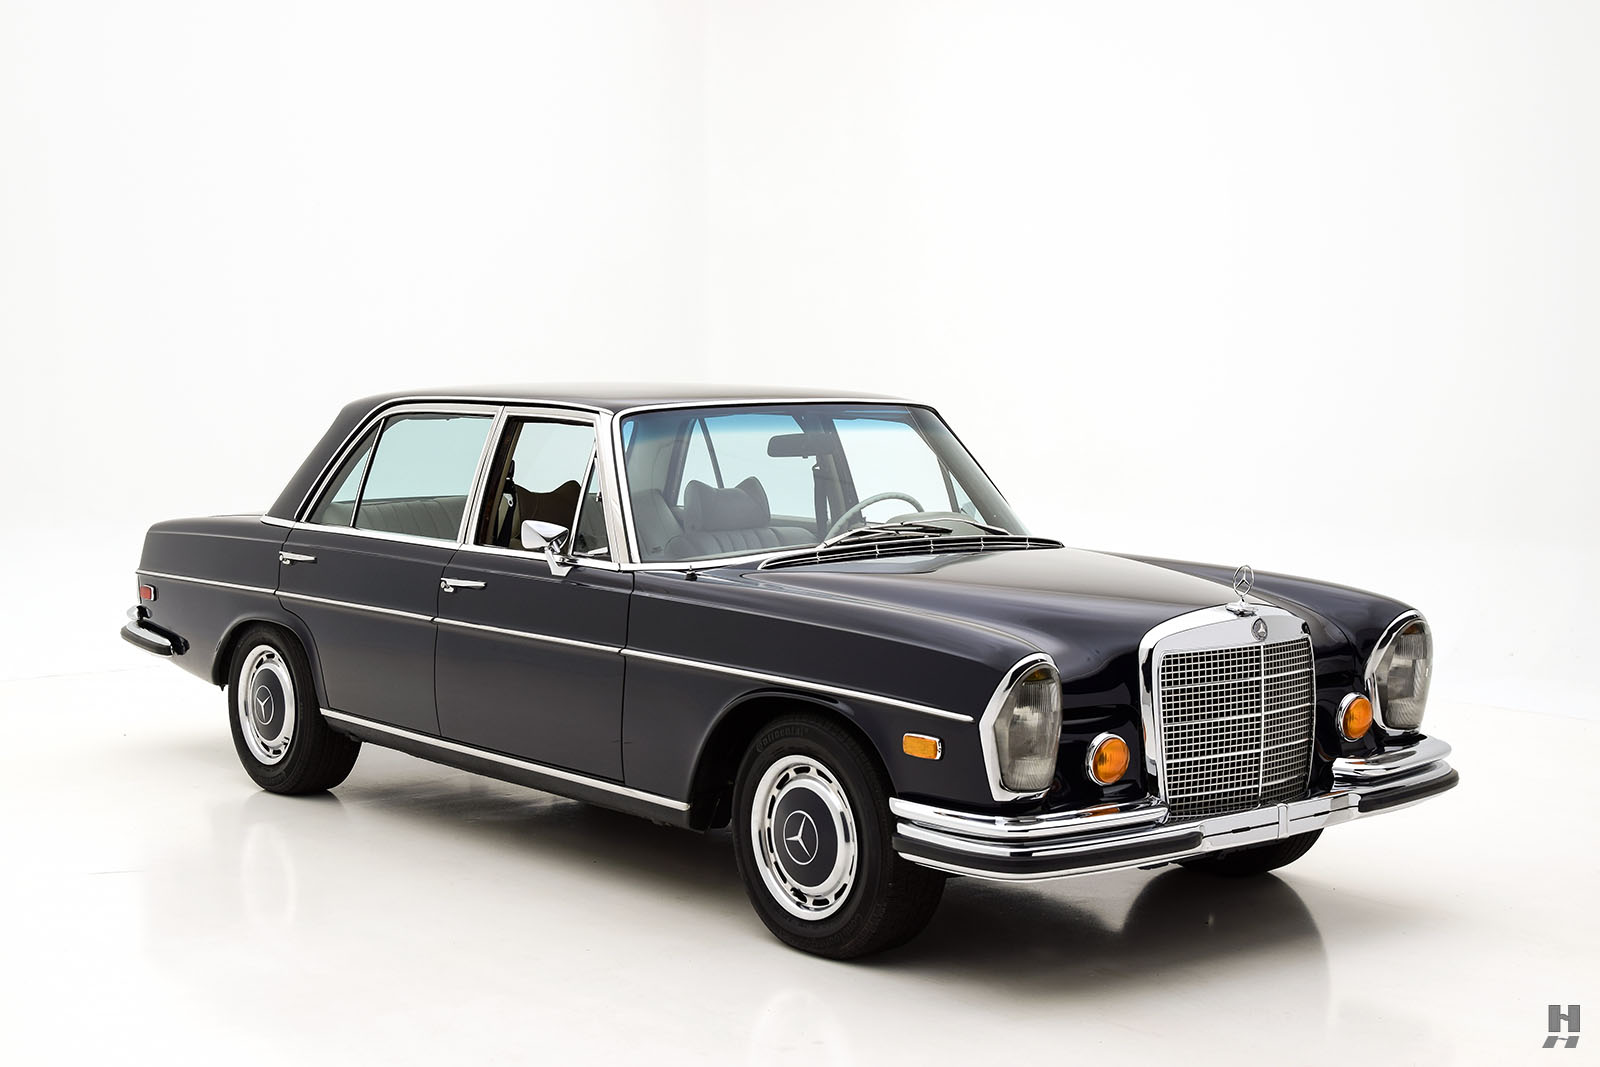 1970 mercedes benz 300 sel 6 3 sedan hyman ltd classic cars. Black Bedroom Furniture Sets. Home Design Ideas